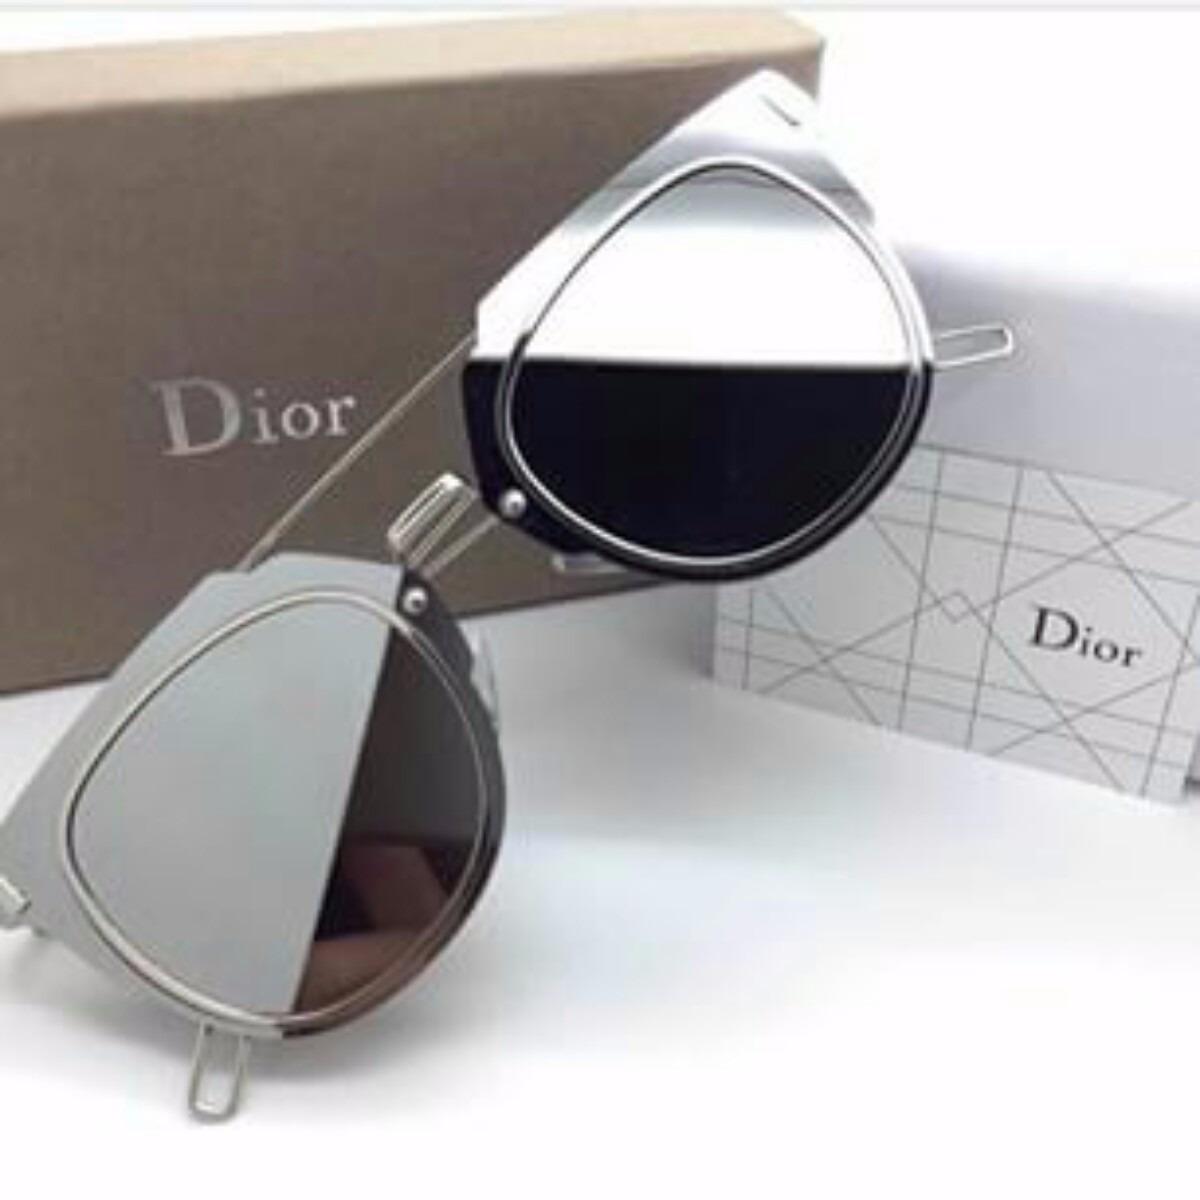 07a84c1327b17 Oculos De Sol Dior Composit 1.0 - Completo Original - R  249